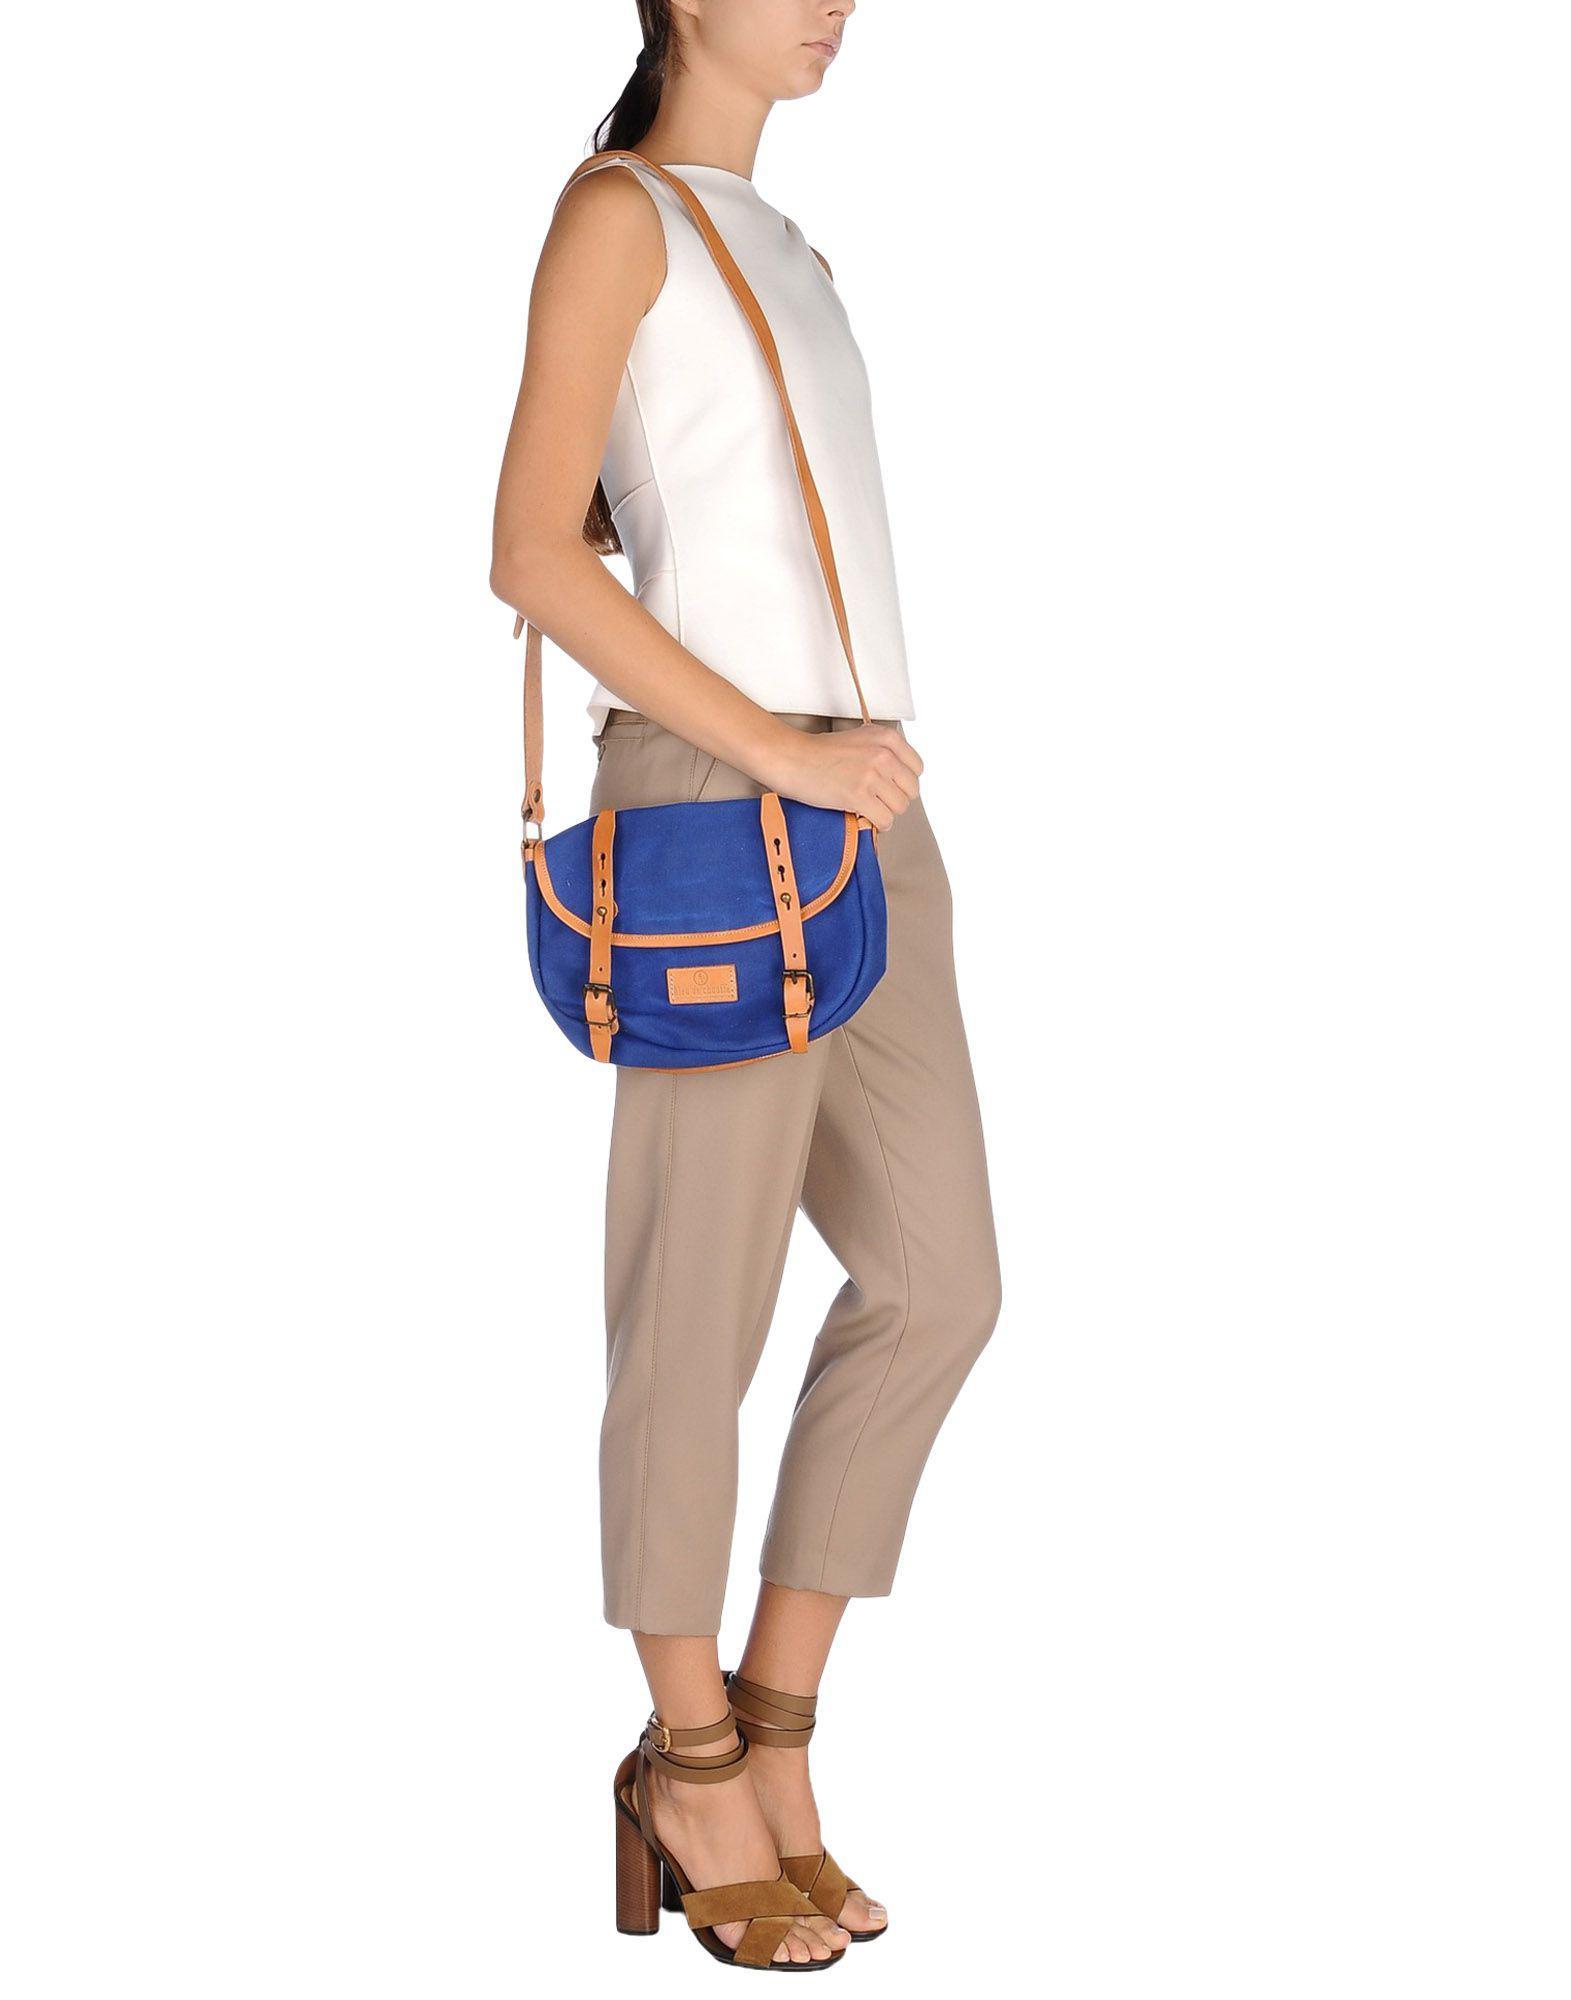 Bleu De Chauffe Canvas Cross-body Bag in Blue